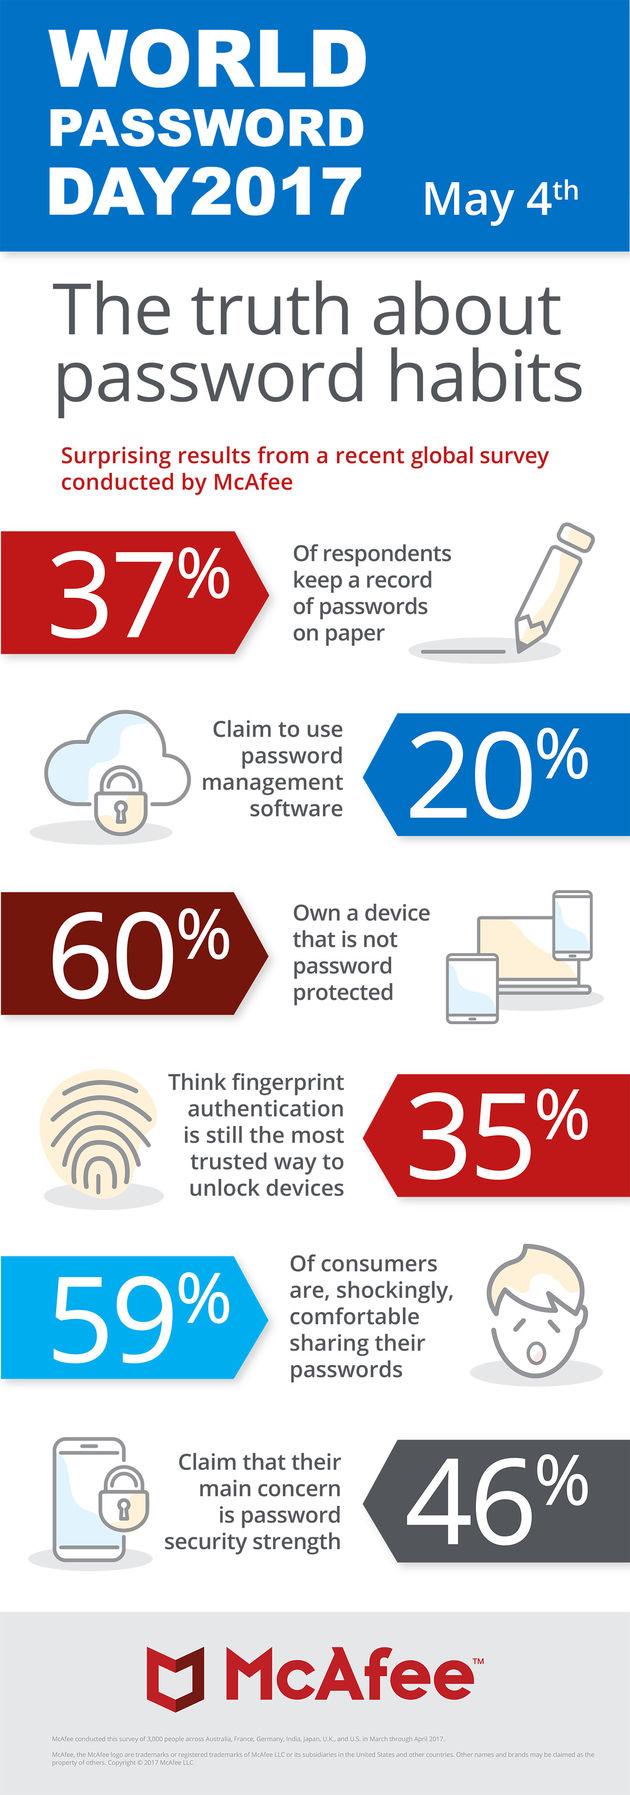 world-password-day-2017